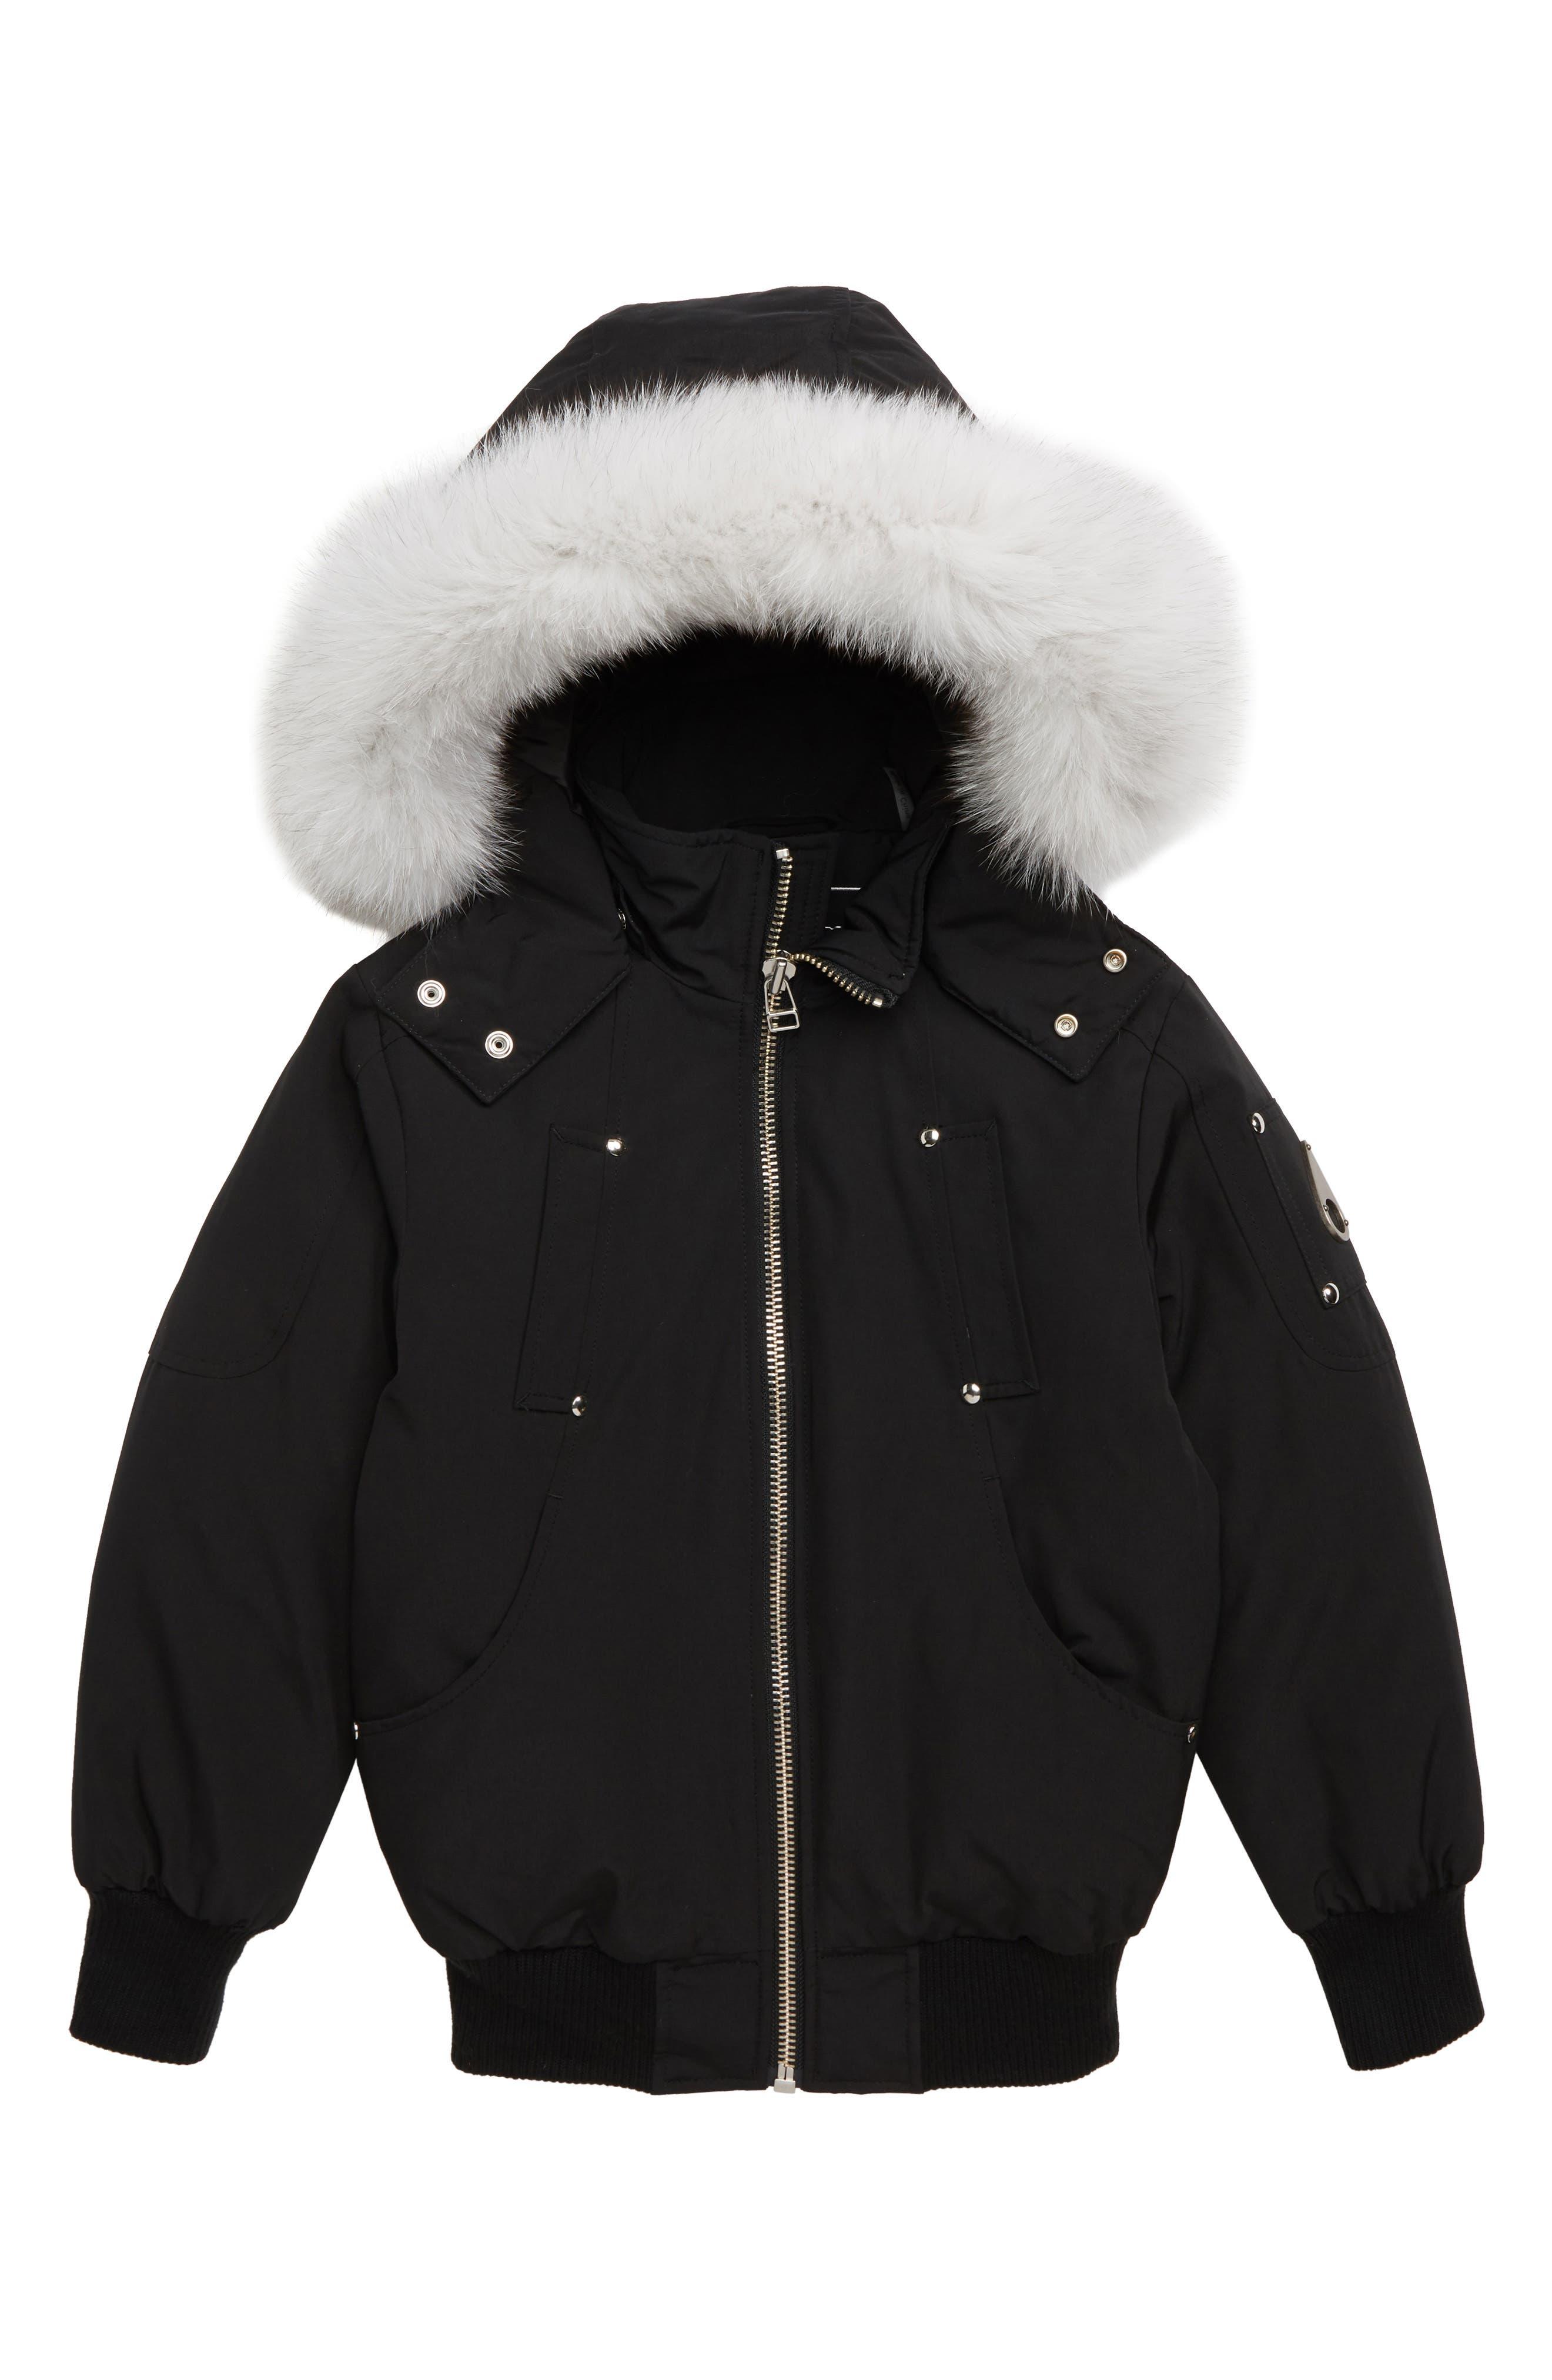 MOOSE KNUCKLES, Bomber Jacket with Genuine Fox Fur Trim, Main thumbnail 1, color, BLACK